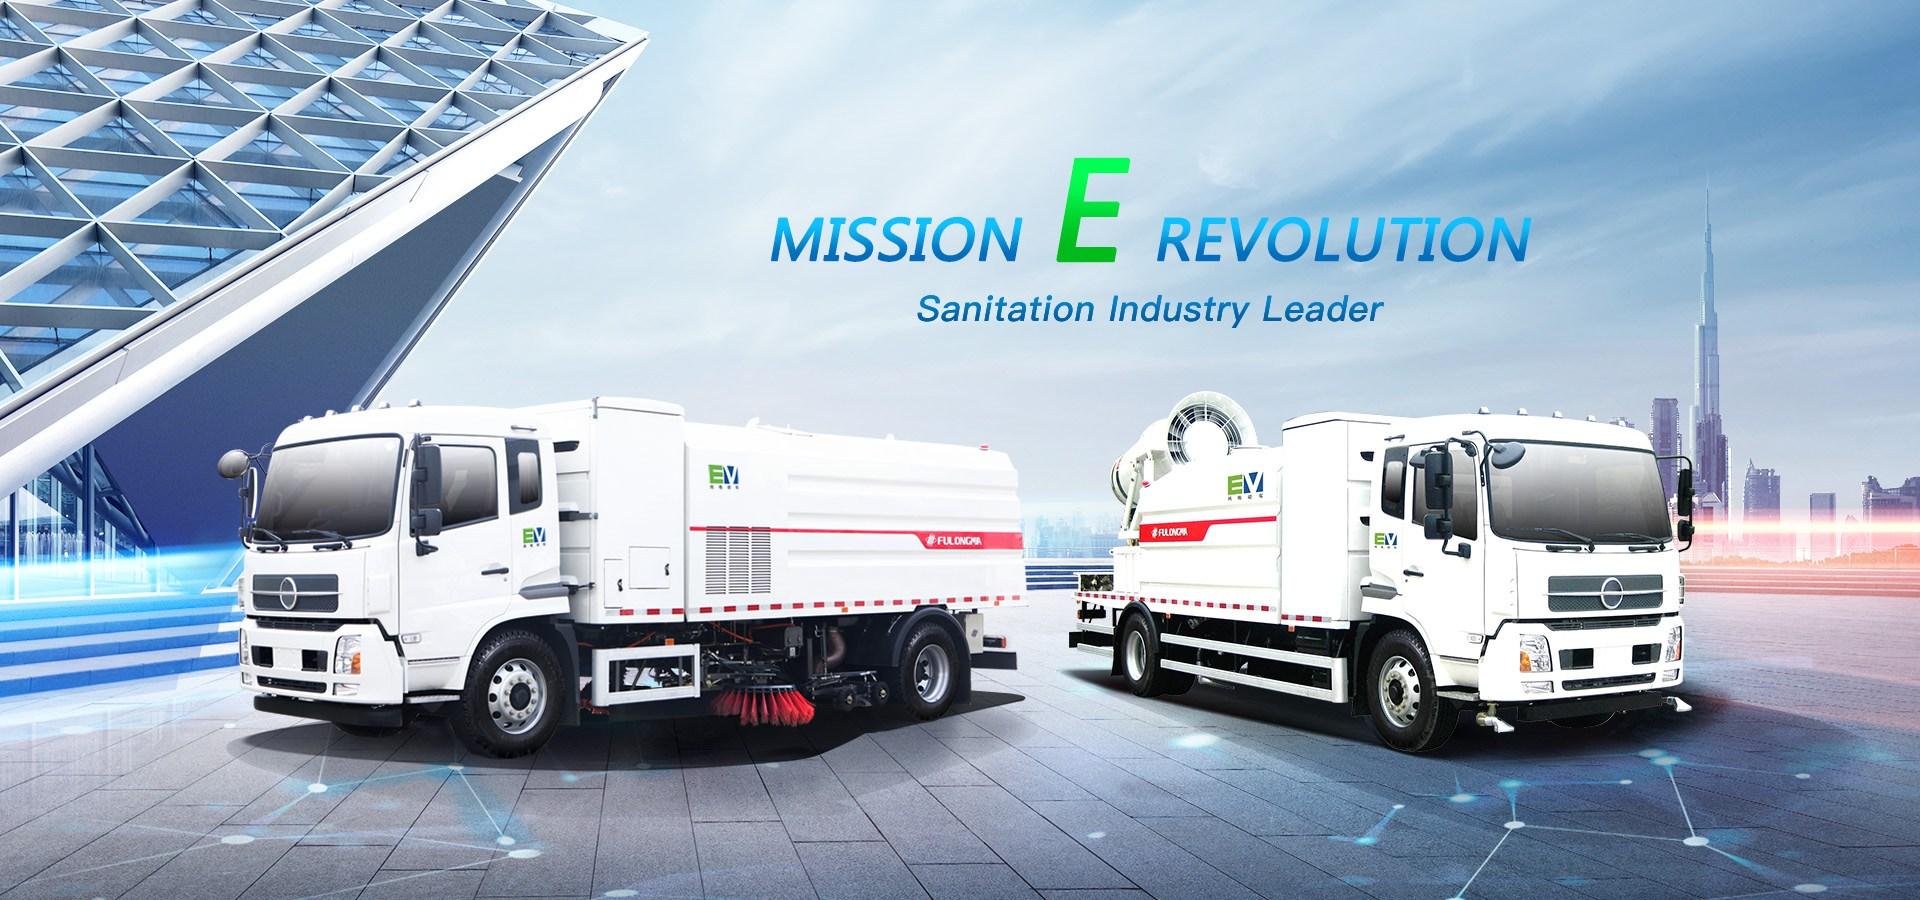 Sanitation Industry Leader